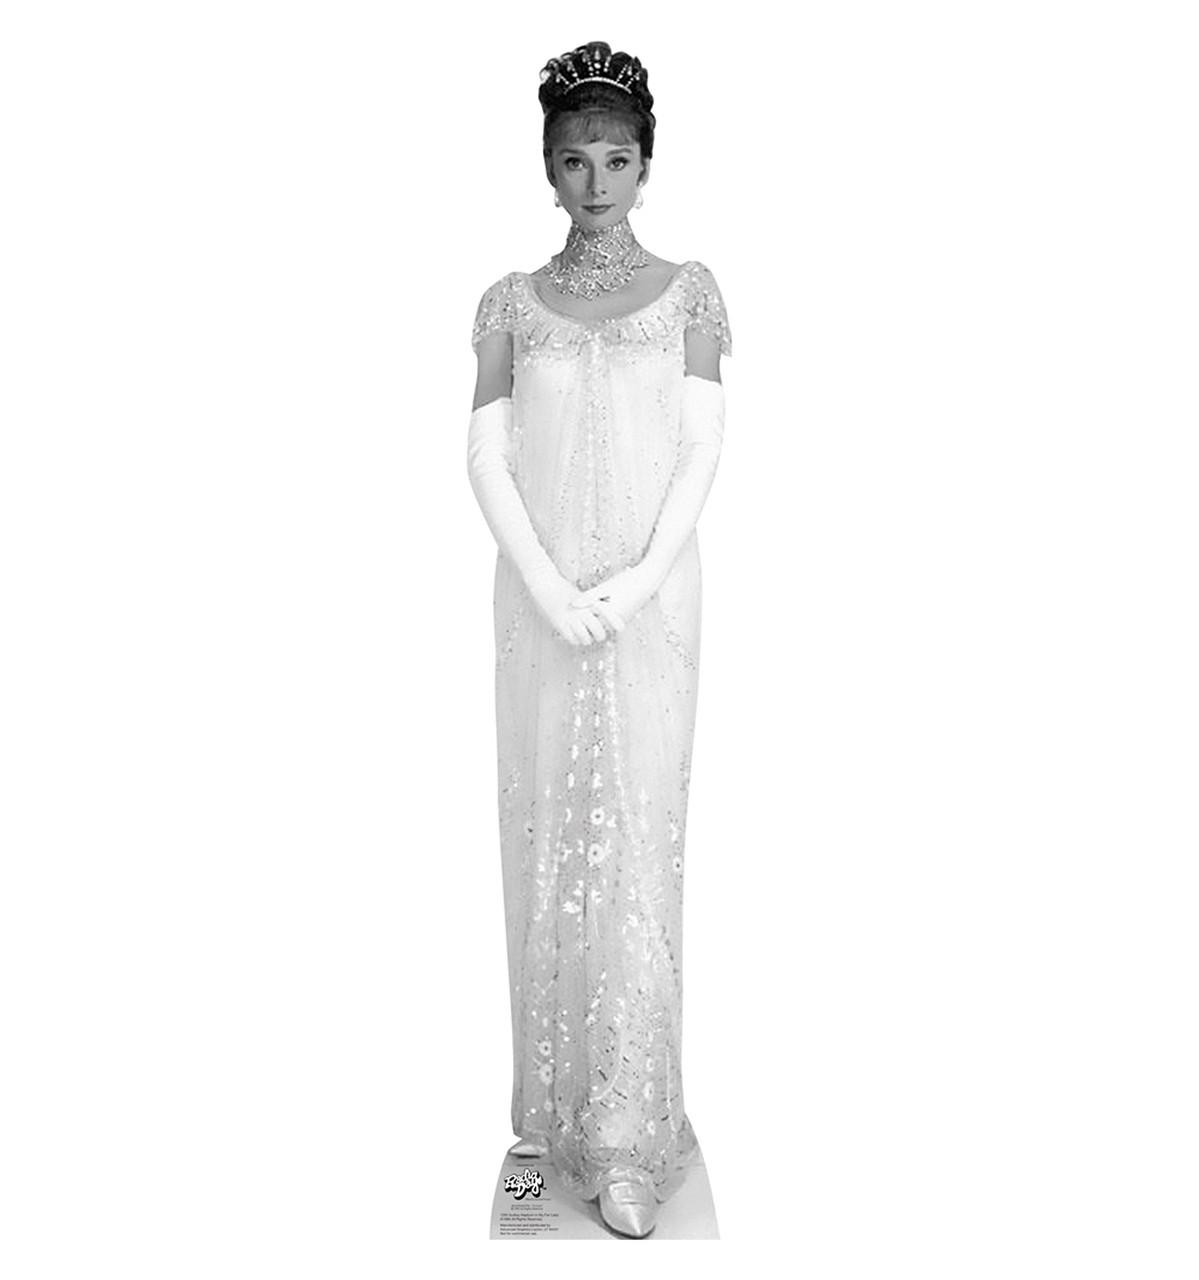 Life-size Audrey Hepburn - My Fair Lady 2 Cardboard Standup   Cardboard Cutout